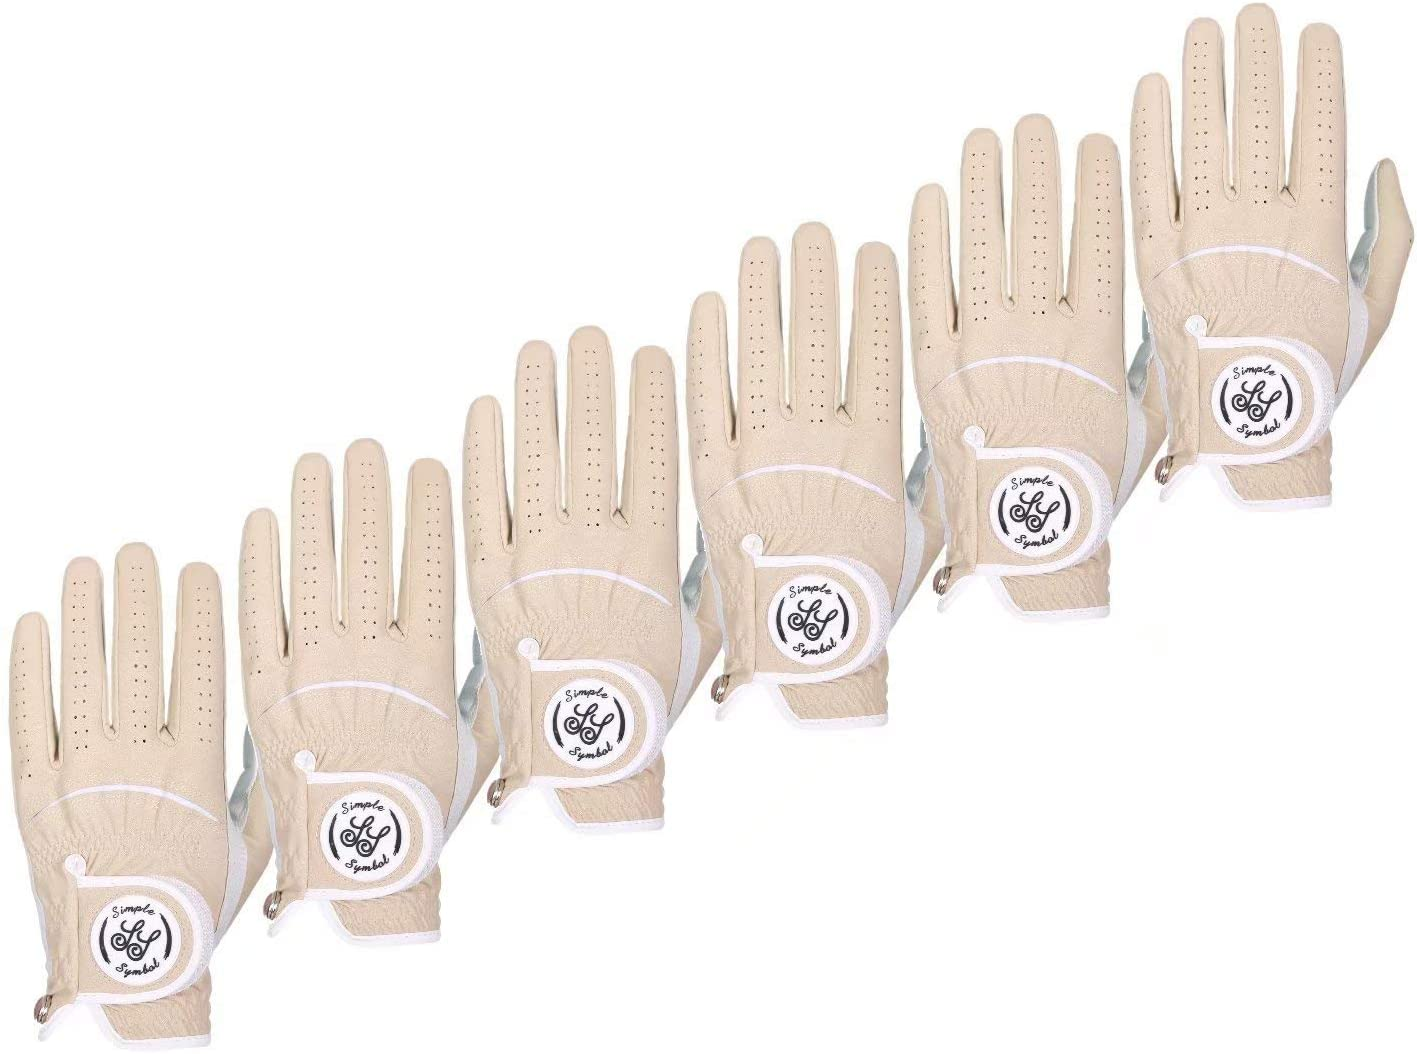 Simple Symbol Long-awaited Men's Golf Glove Grade Manufacturer OFFicial shop Pack, Six Leather High